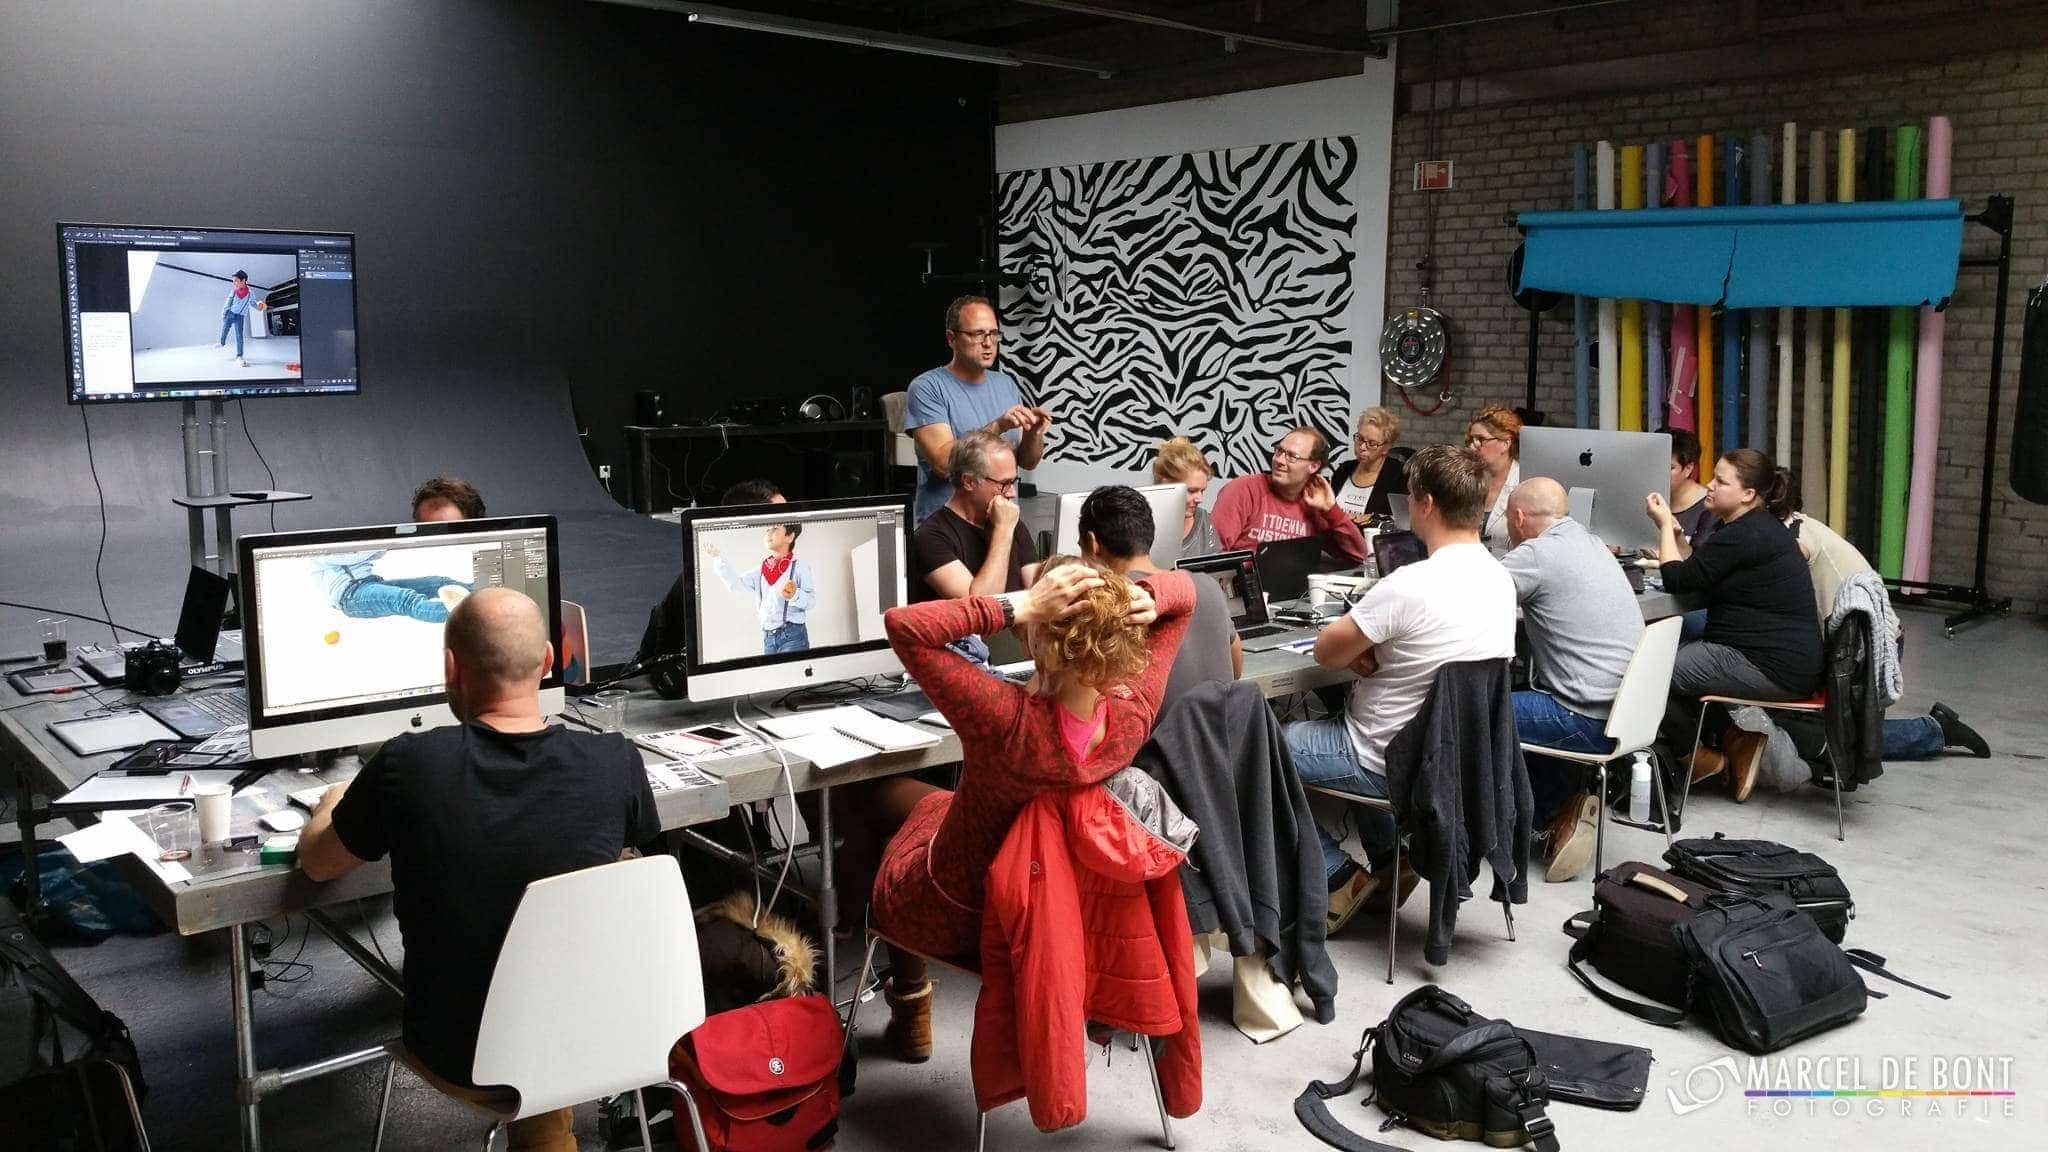 Workshop Adrian Sommerlink conceptuele fotografie in studio 34x, Almere